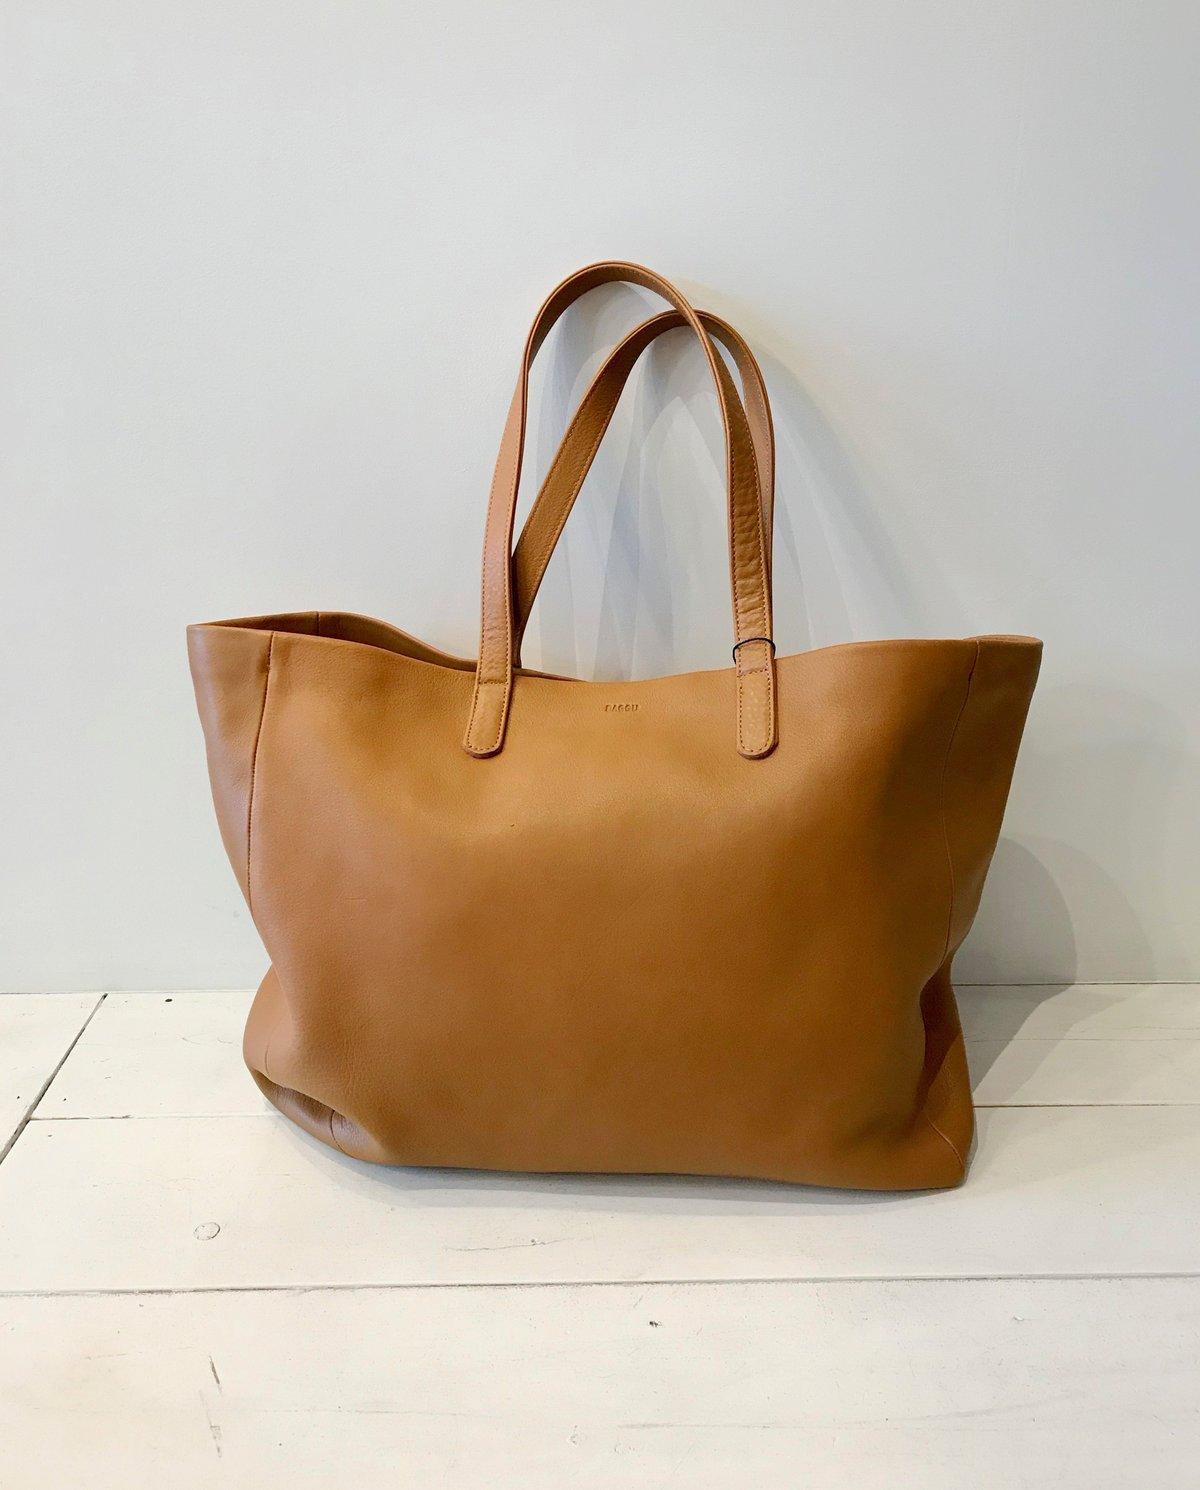 95e1641bcee7 BAGGU Oversized Leather Tote - Camel